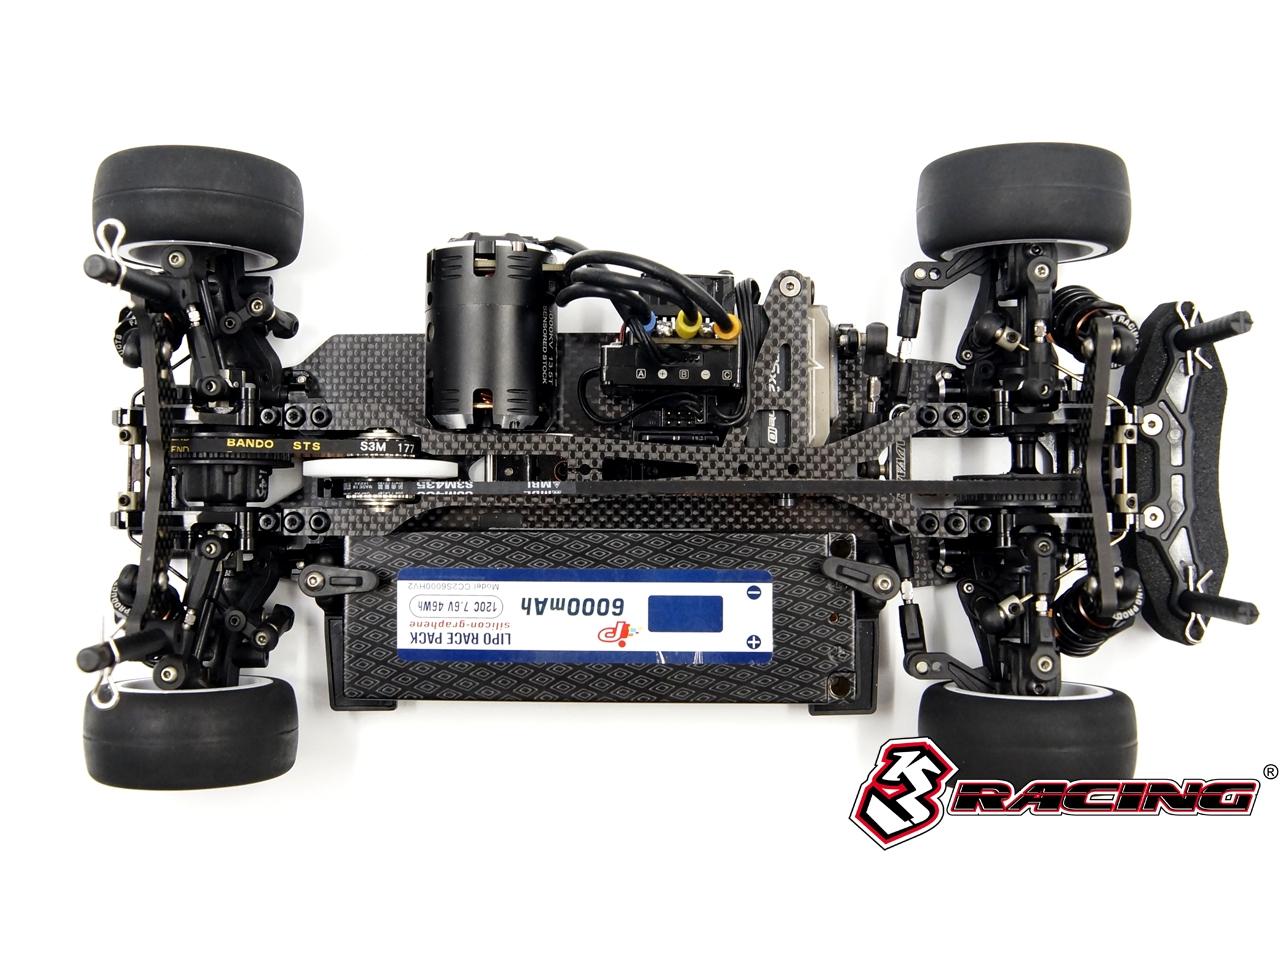 3Racing Sakura M4 Pro